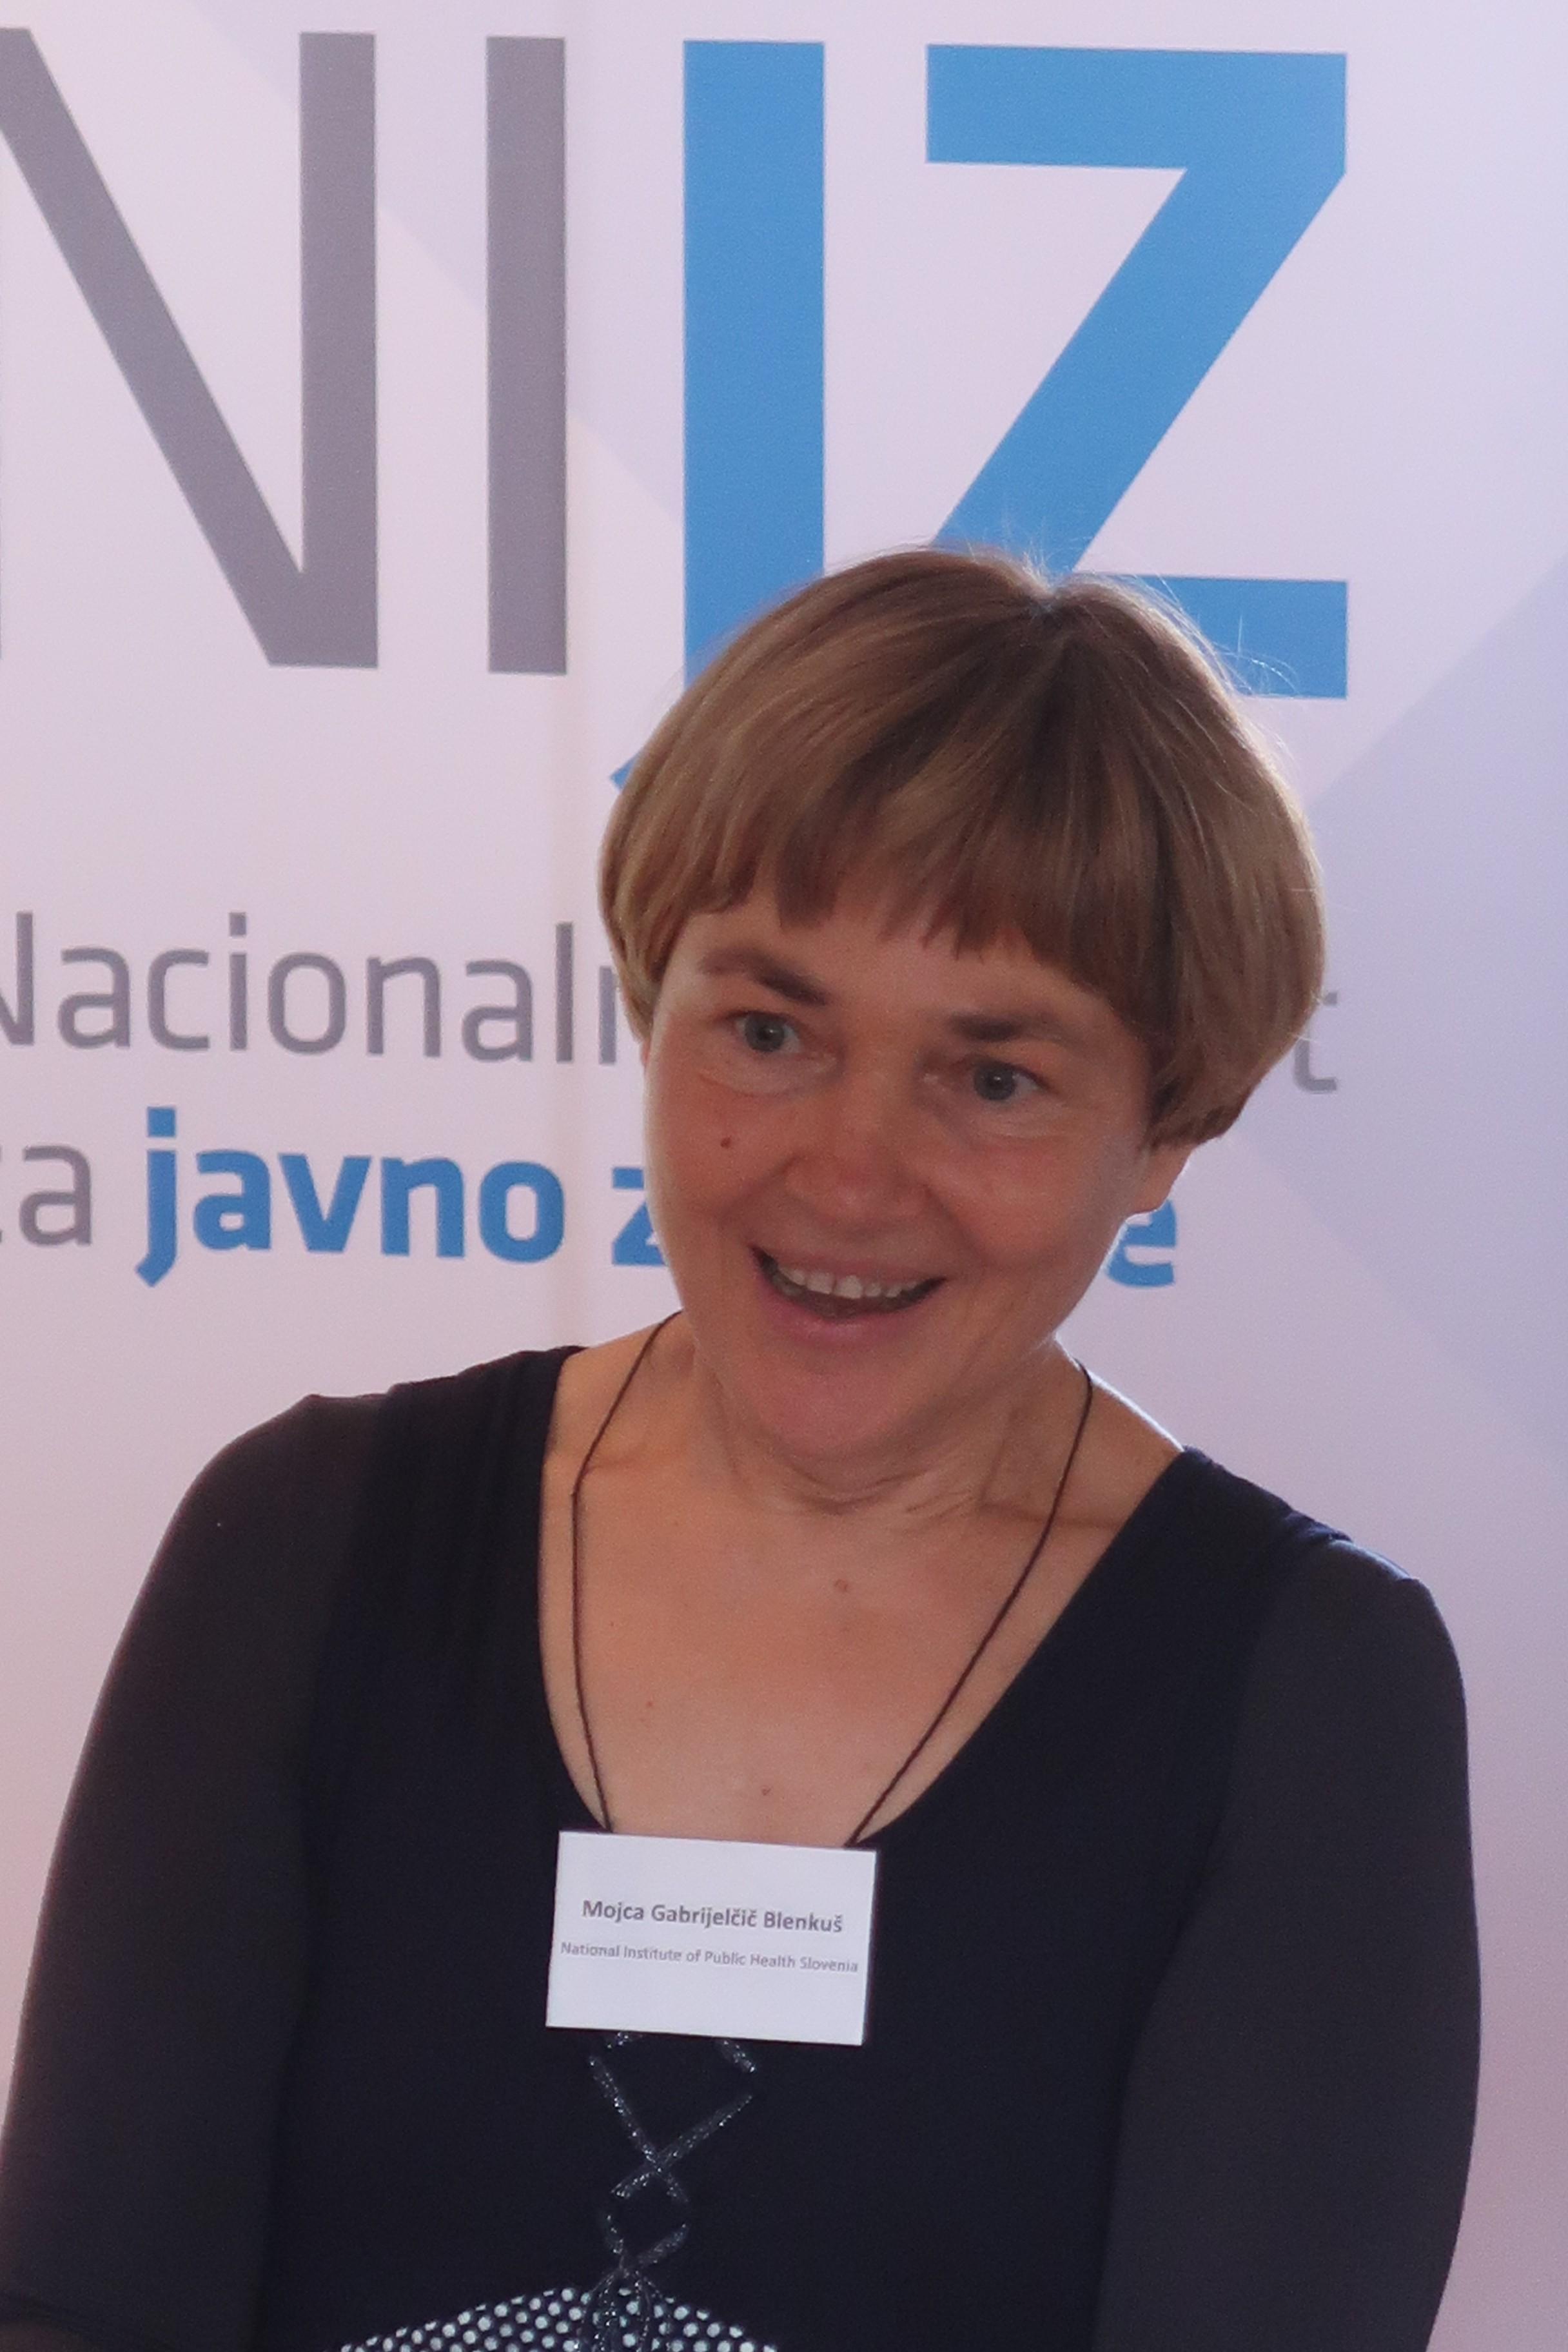 Dr. Mojca Gabrijelčič, NIJZ – National Institute of Public Health Slovenia